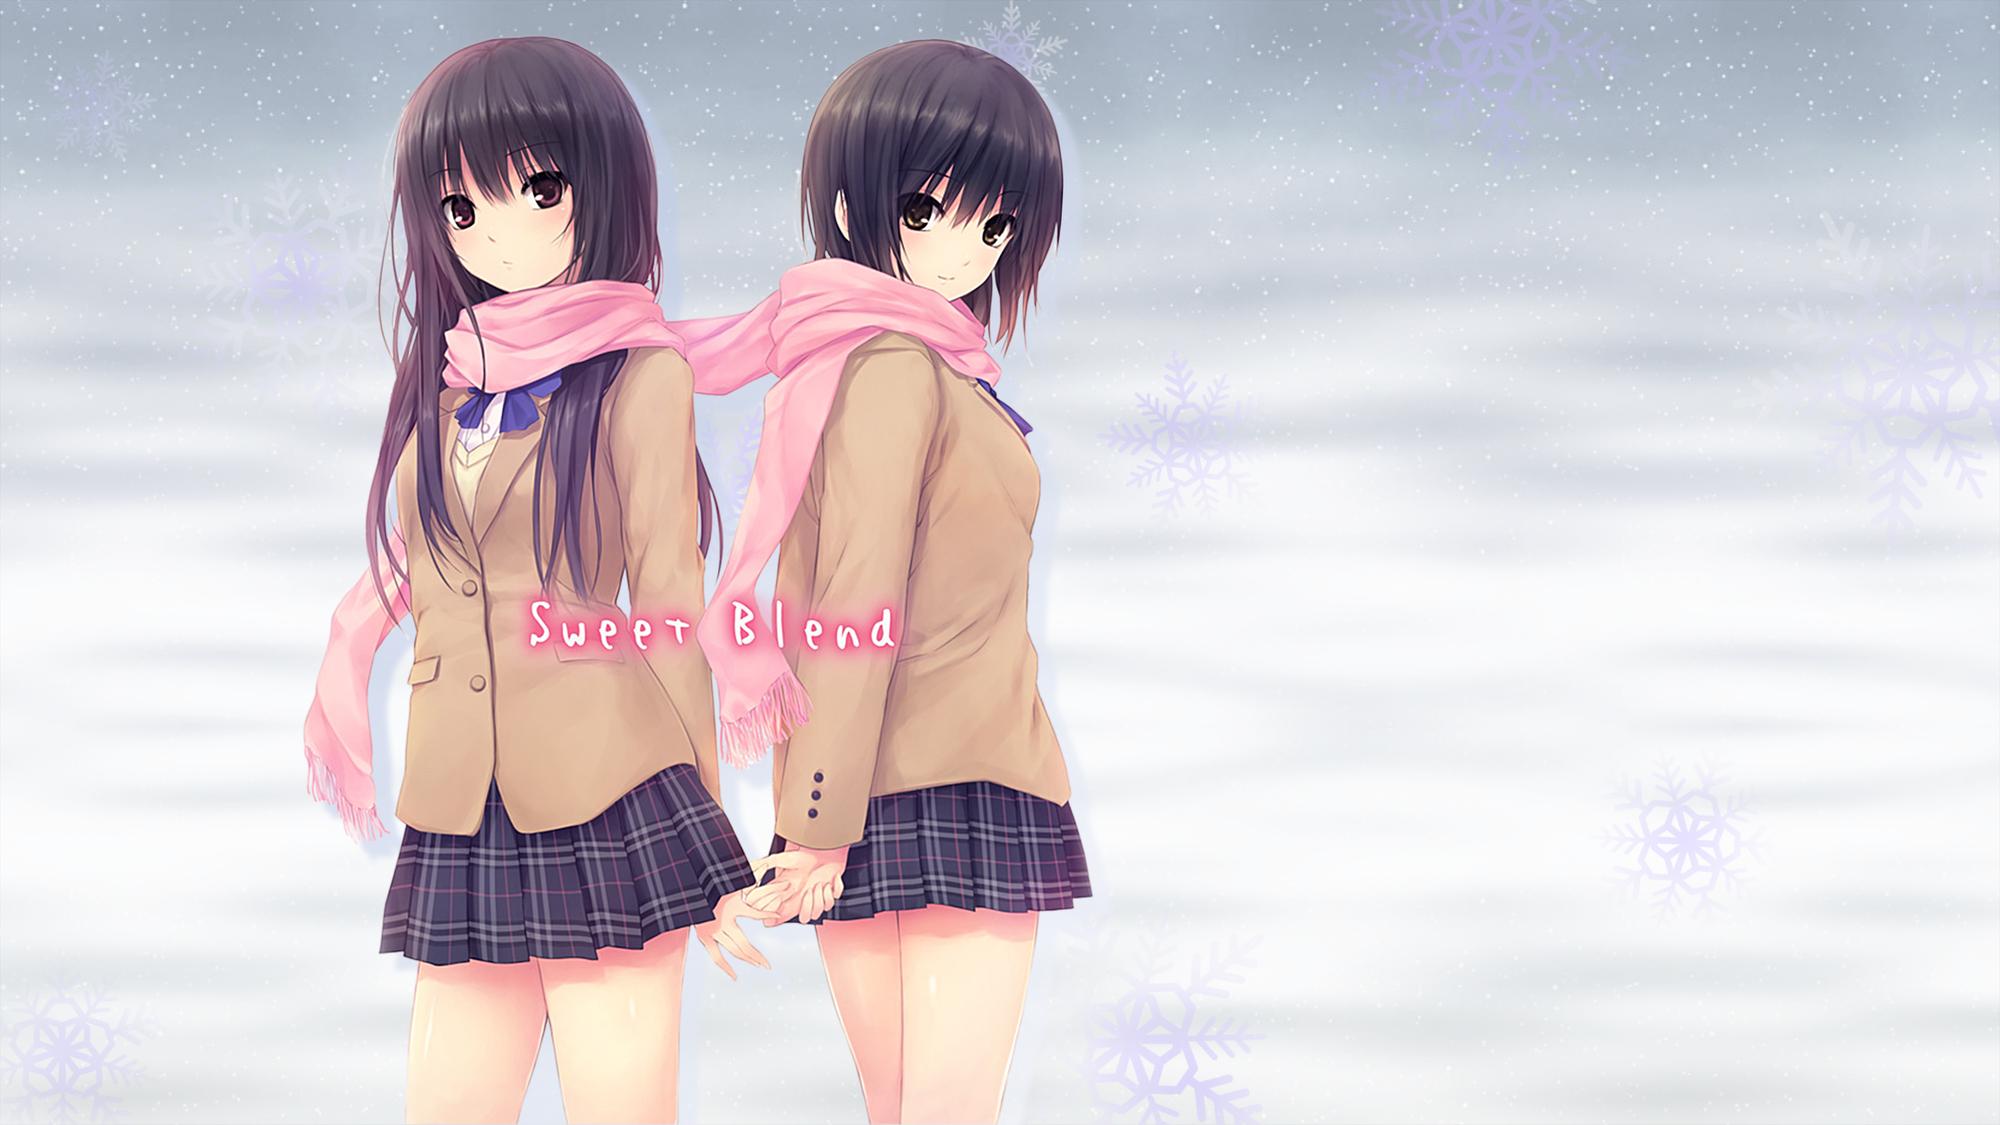 2girls aoyama_sumika black_hair brown_eyes coffee-kizoku long_hair original purple_eyes scarf school_uniform shiramine_rika short_hair skirt snow